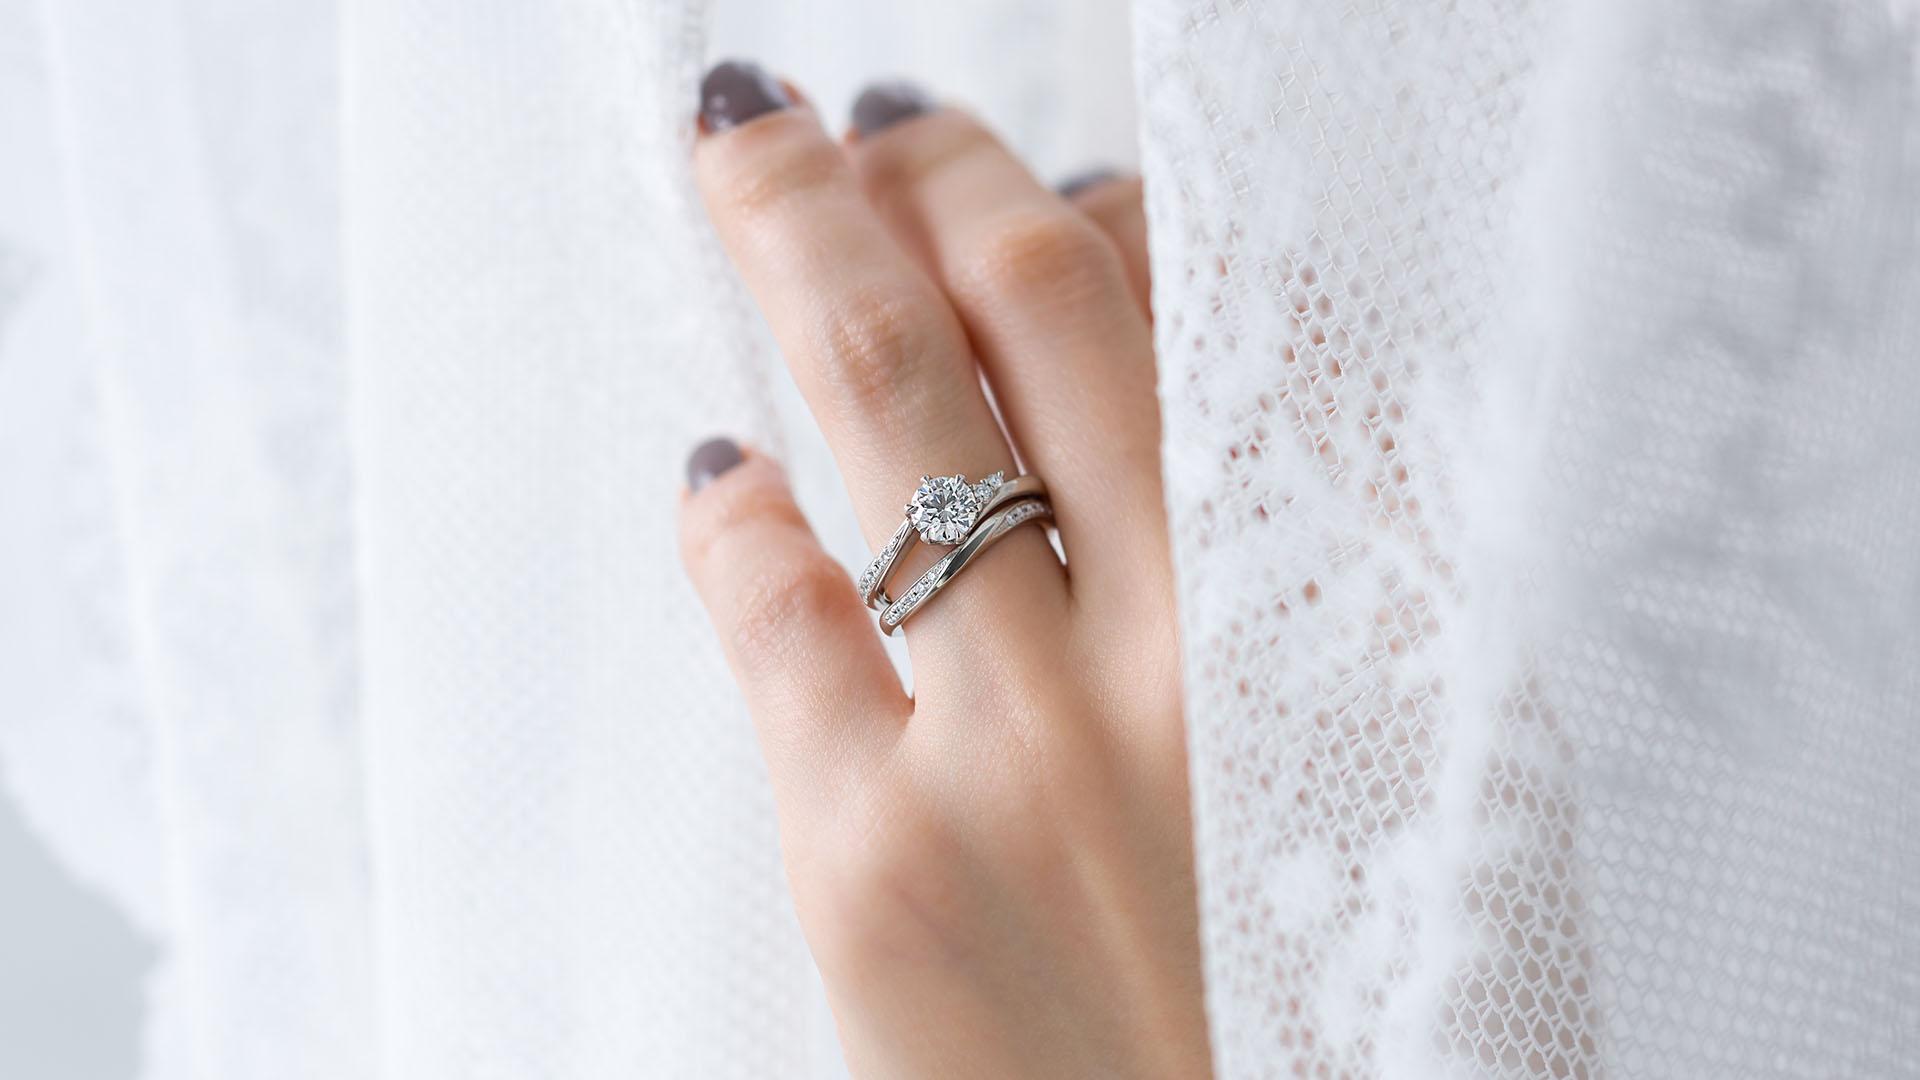 perseus ペルセウス | 結婚指輪サムネイル 5